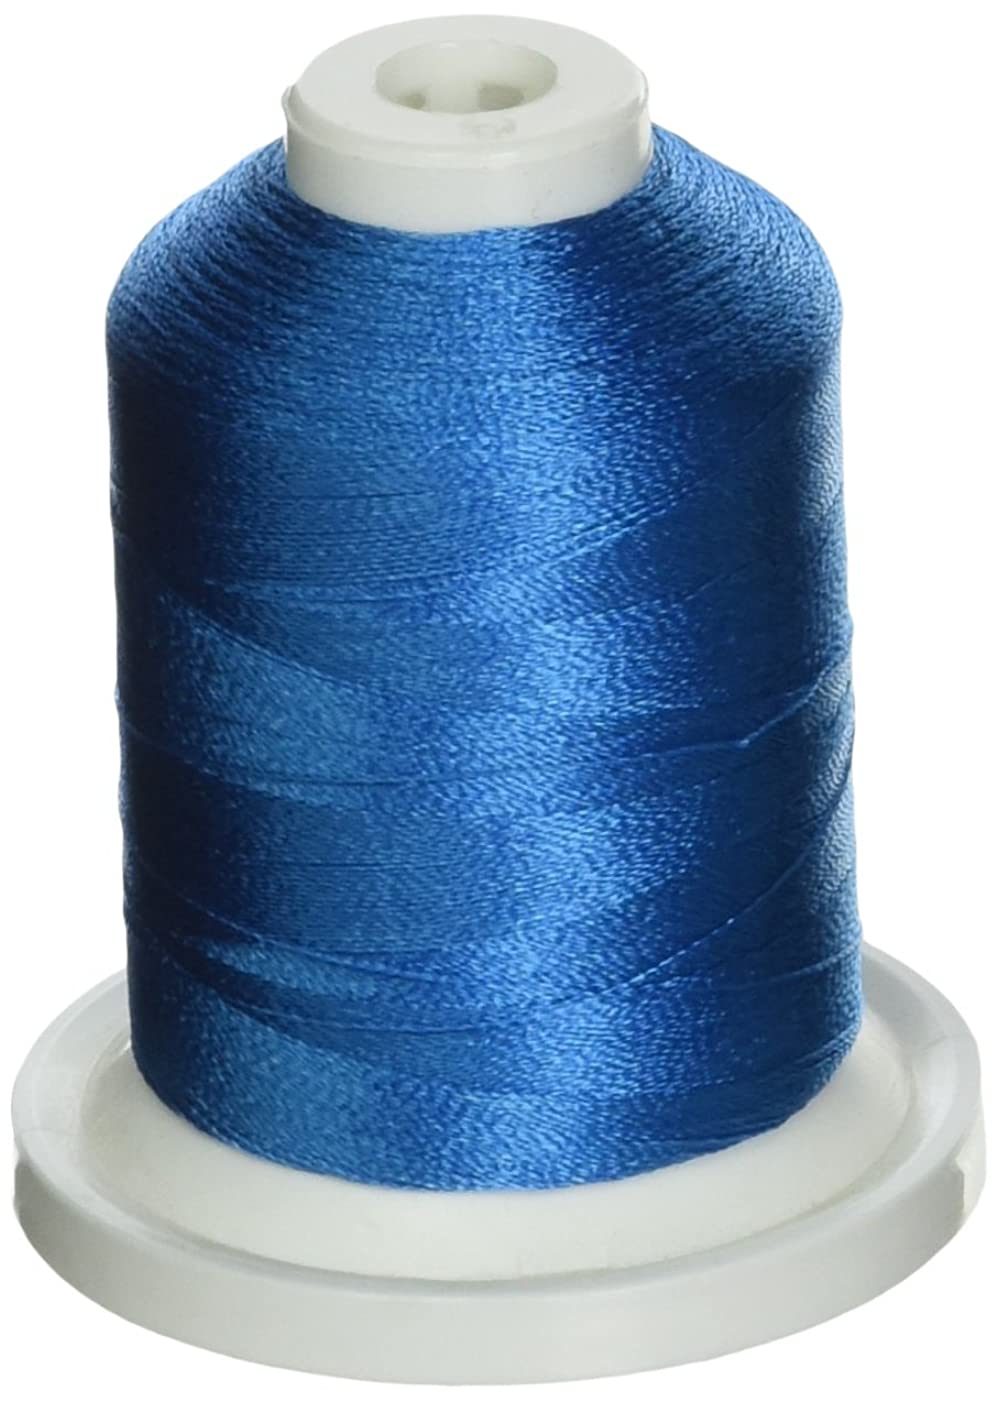 Robison-Anton Rayon Super Strength Thread, 1100-Yard, Pro-Band Blue